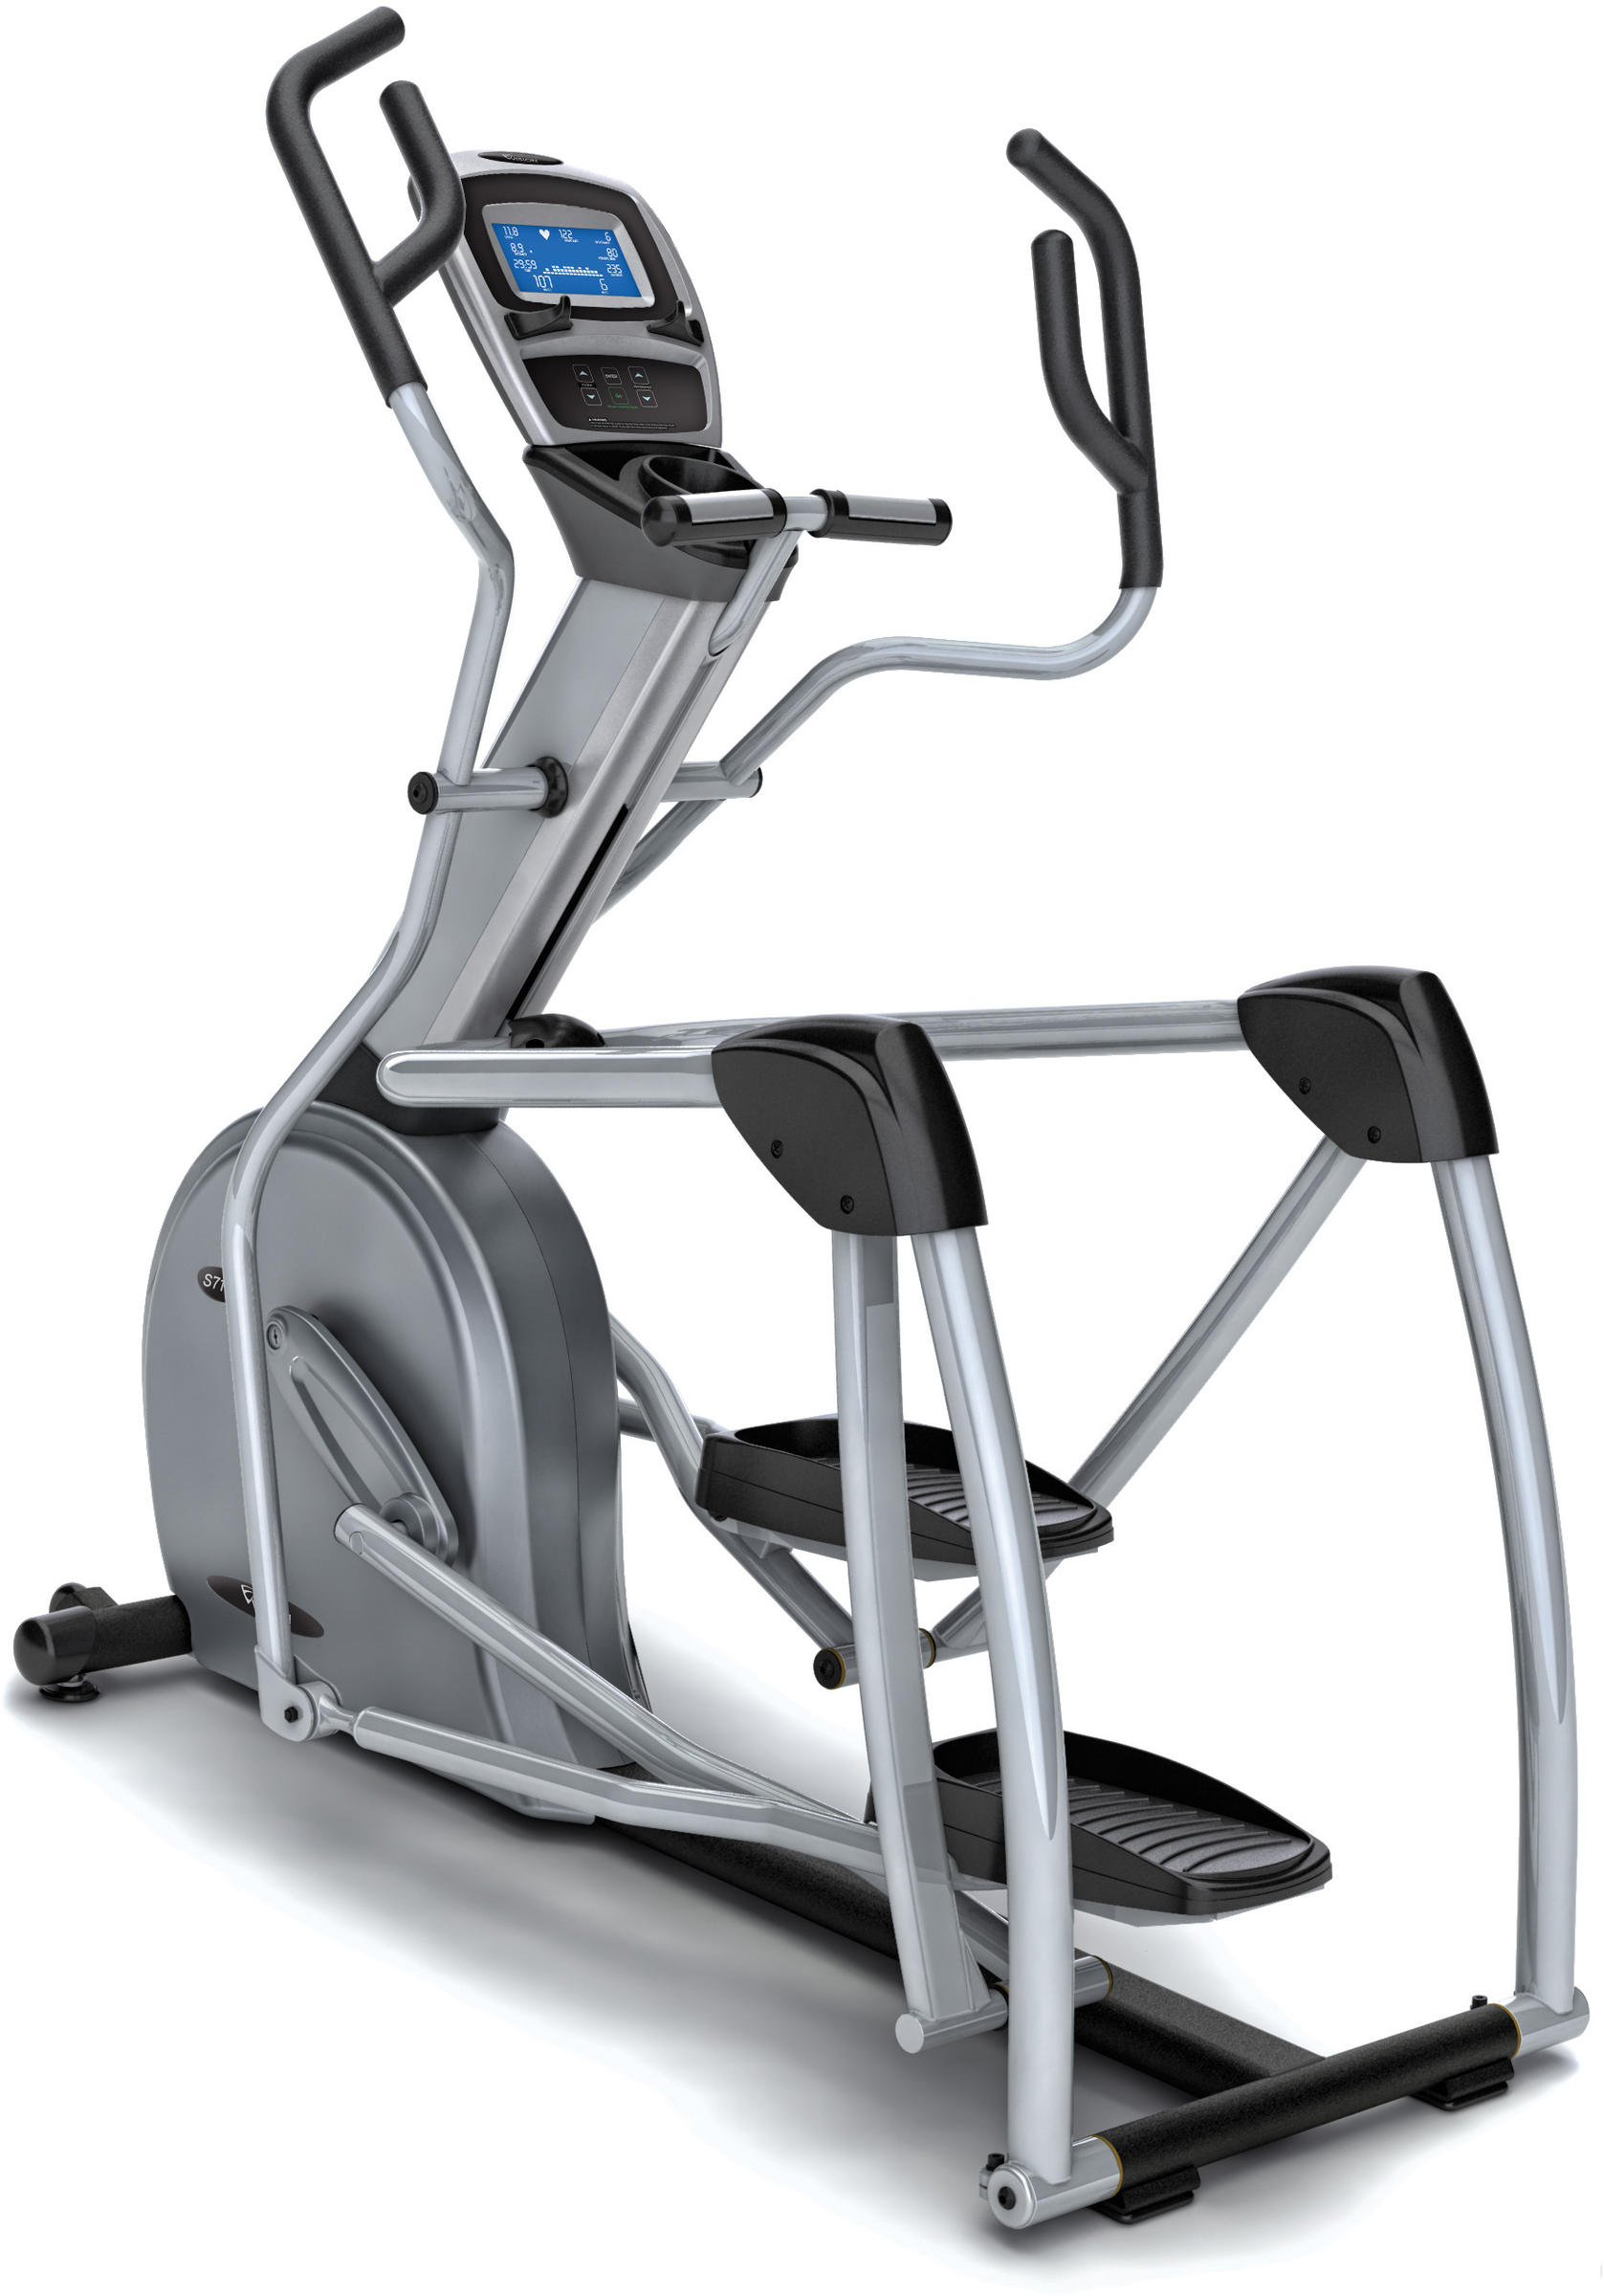 the elliptical machine